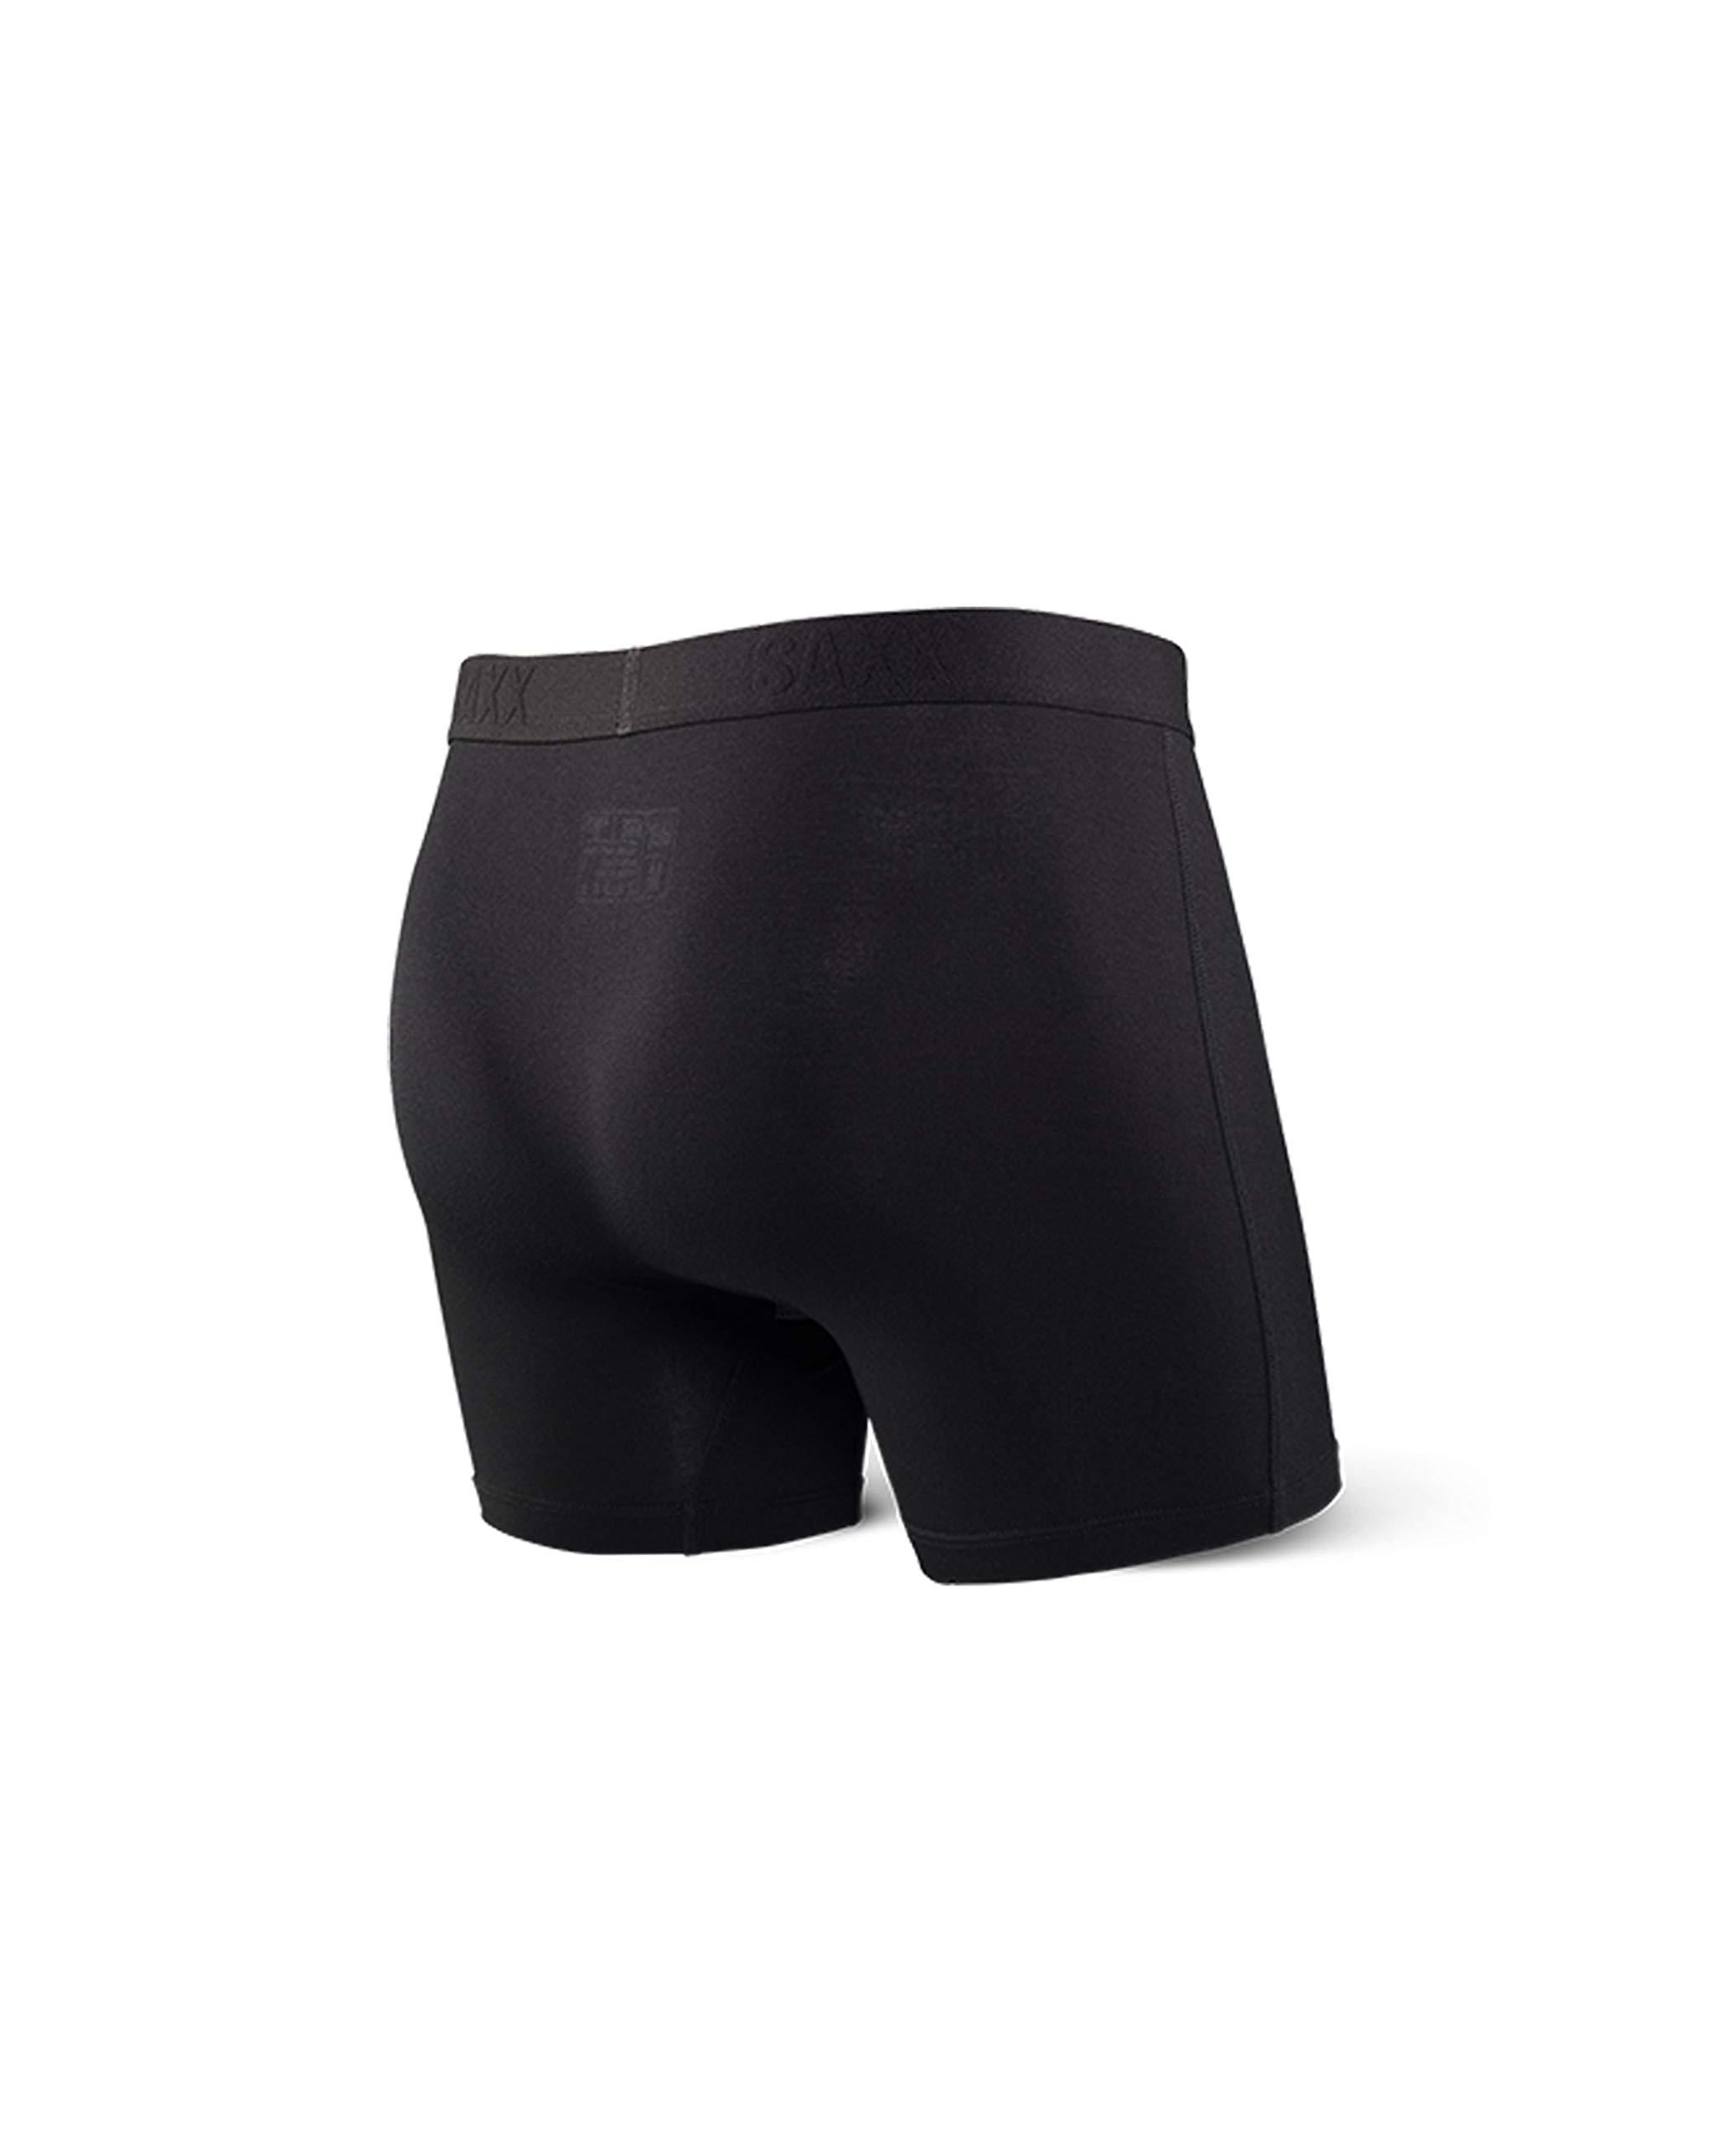 c745bbb647410e Saxx Underwear Vibe Men's Boxer Briefs Ballpark Pouch Black Large -  SXBM35.BBK < Boxer Briefs < Clothing, Shoes & Jewelry - tibs